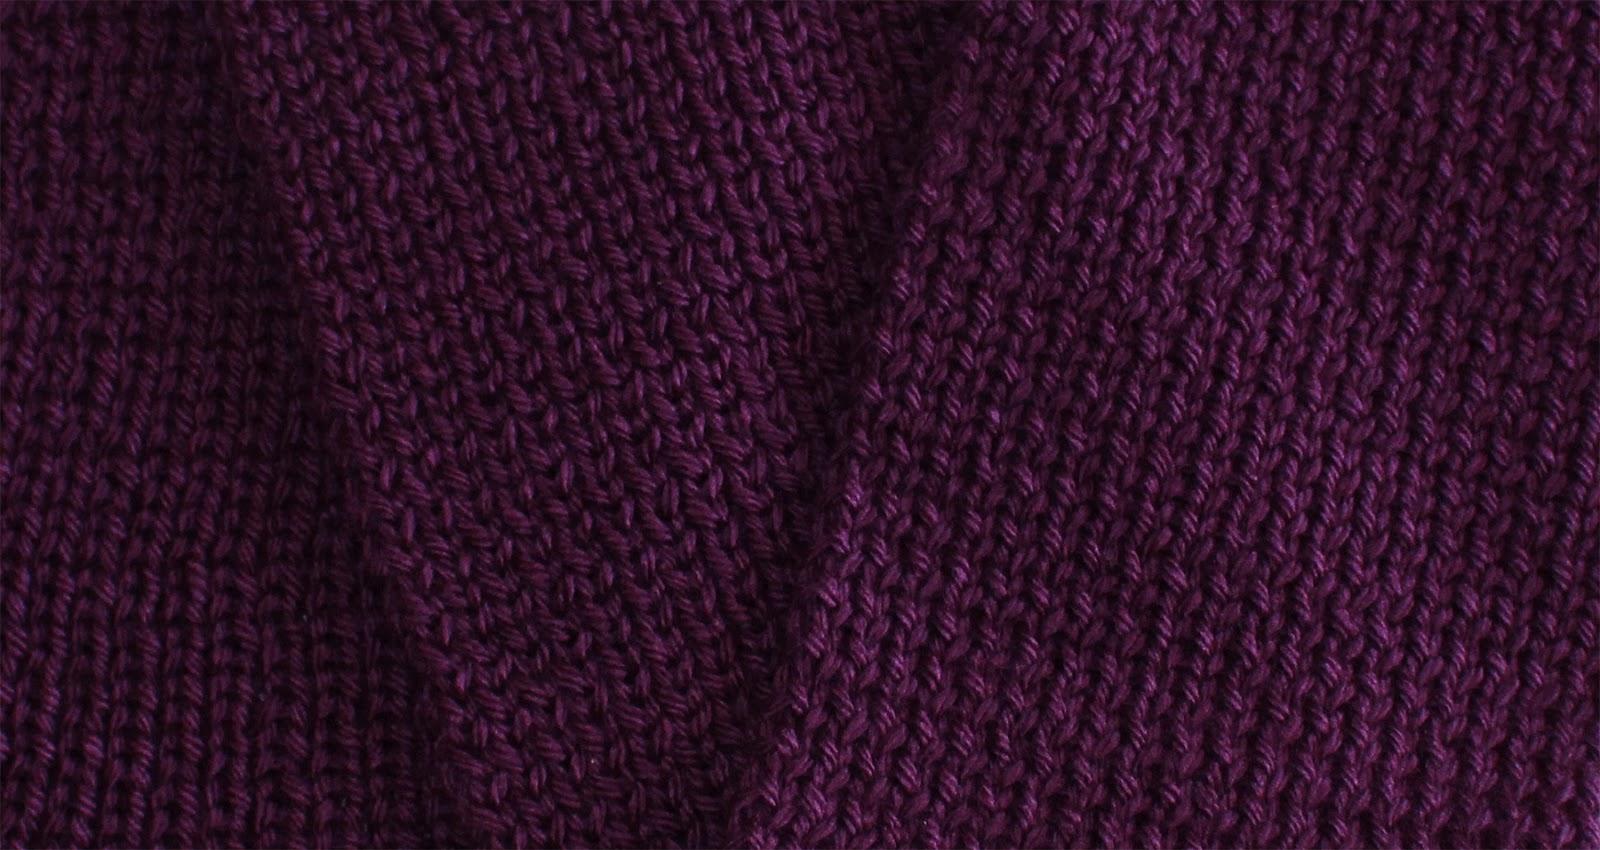 Purllin Acai Infinity Circle Scarf Free Knitting Pattern